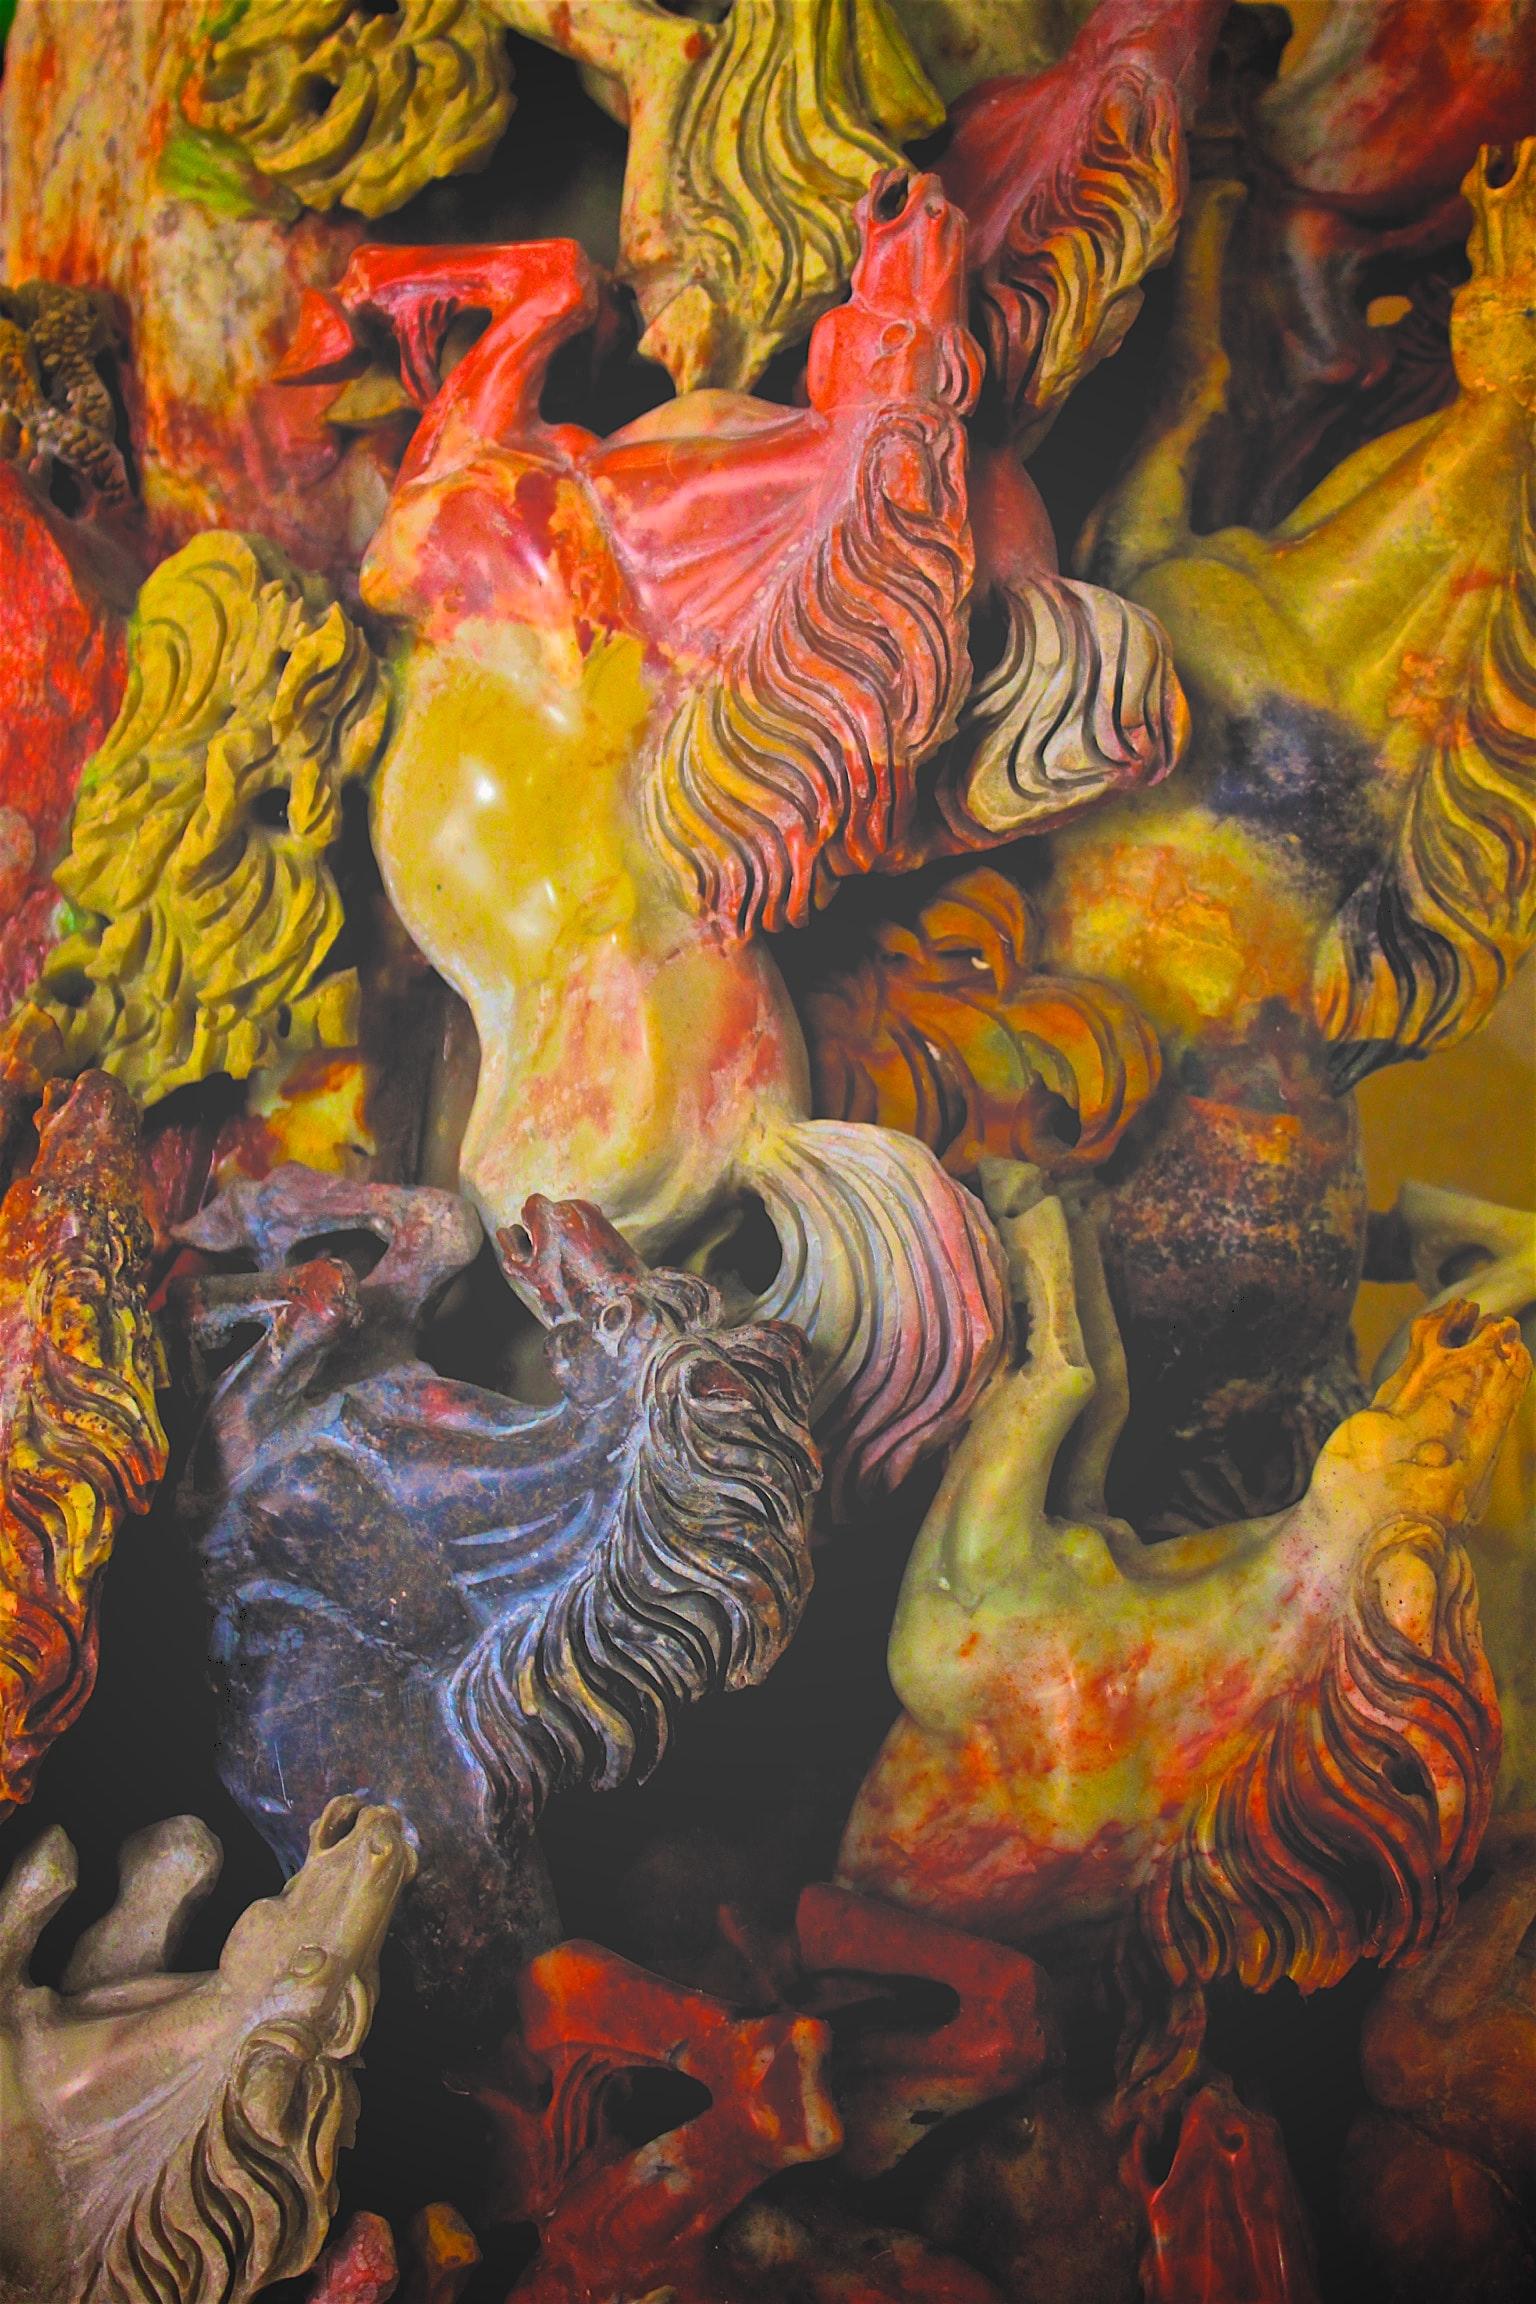 Abstract Horse Painting Photo Free Art Image On Unsplash